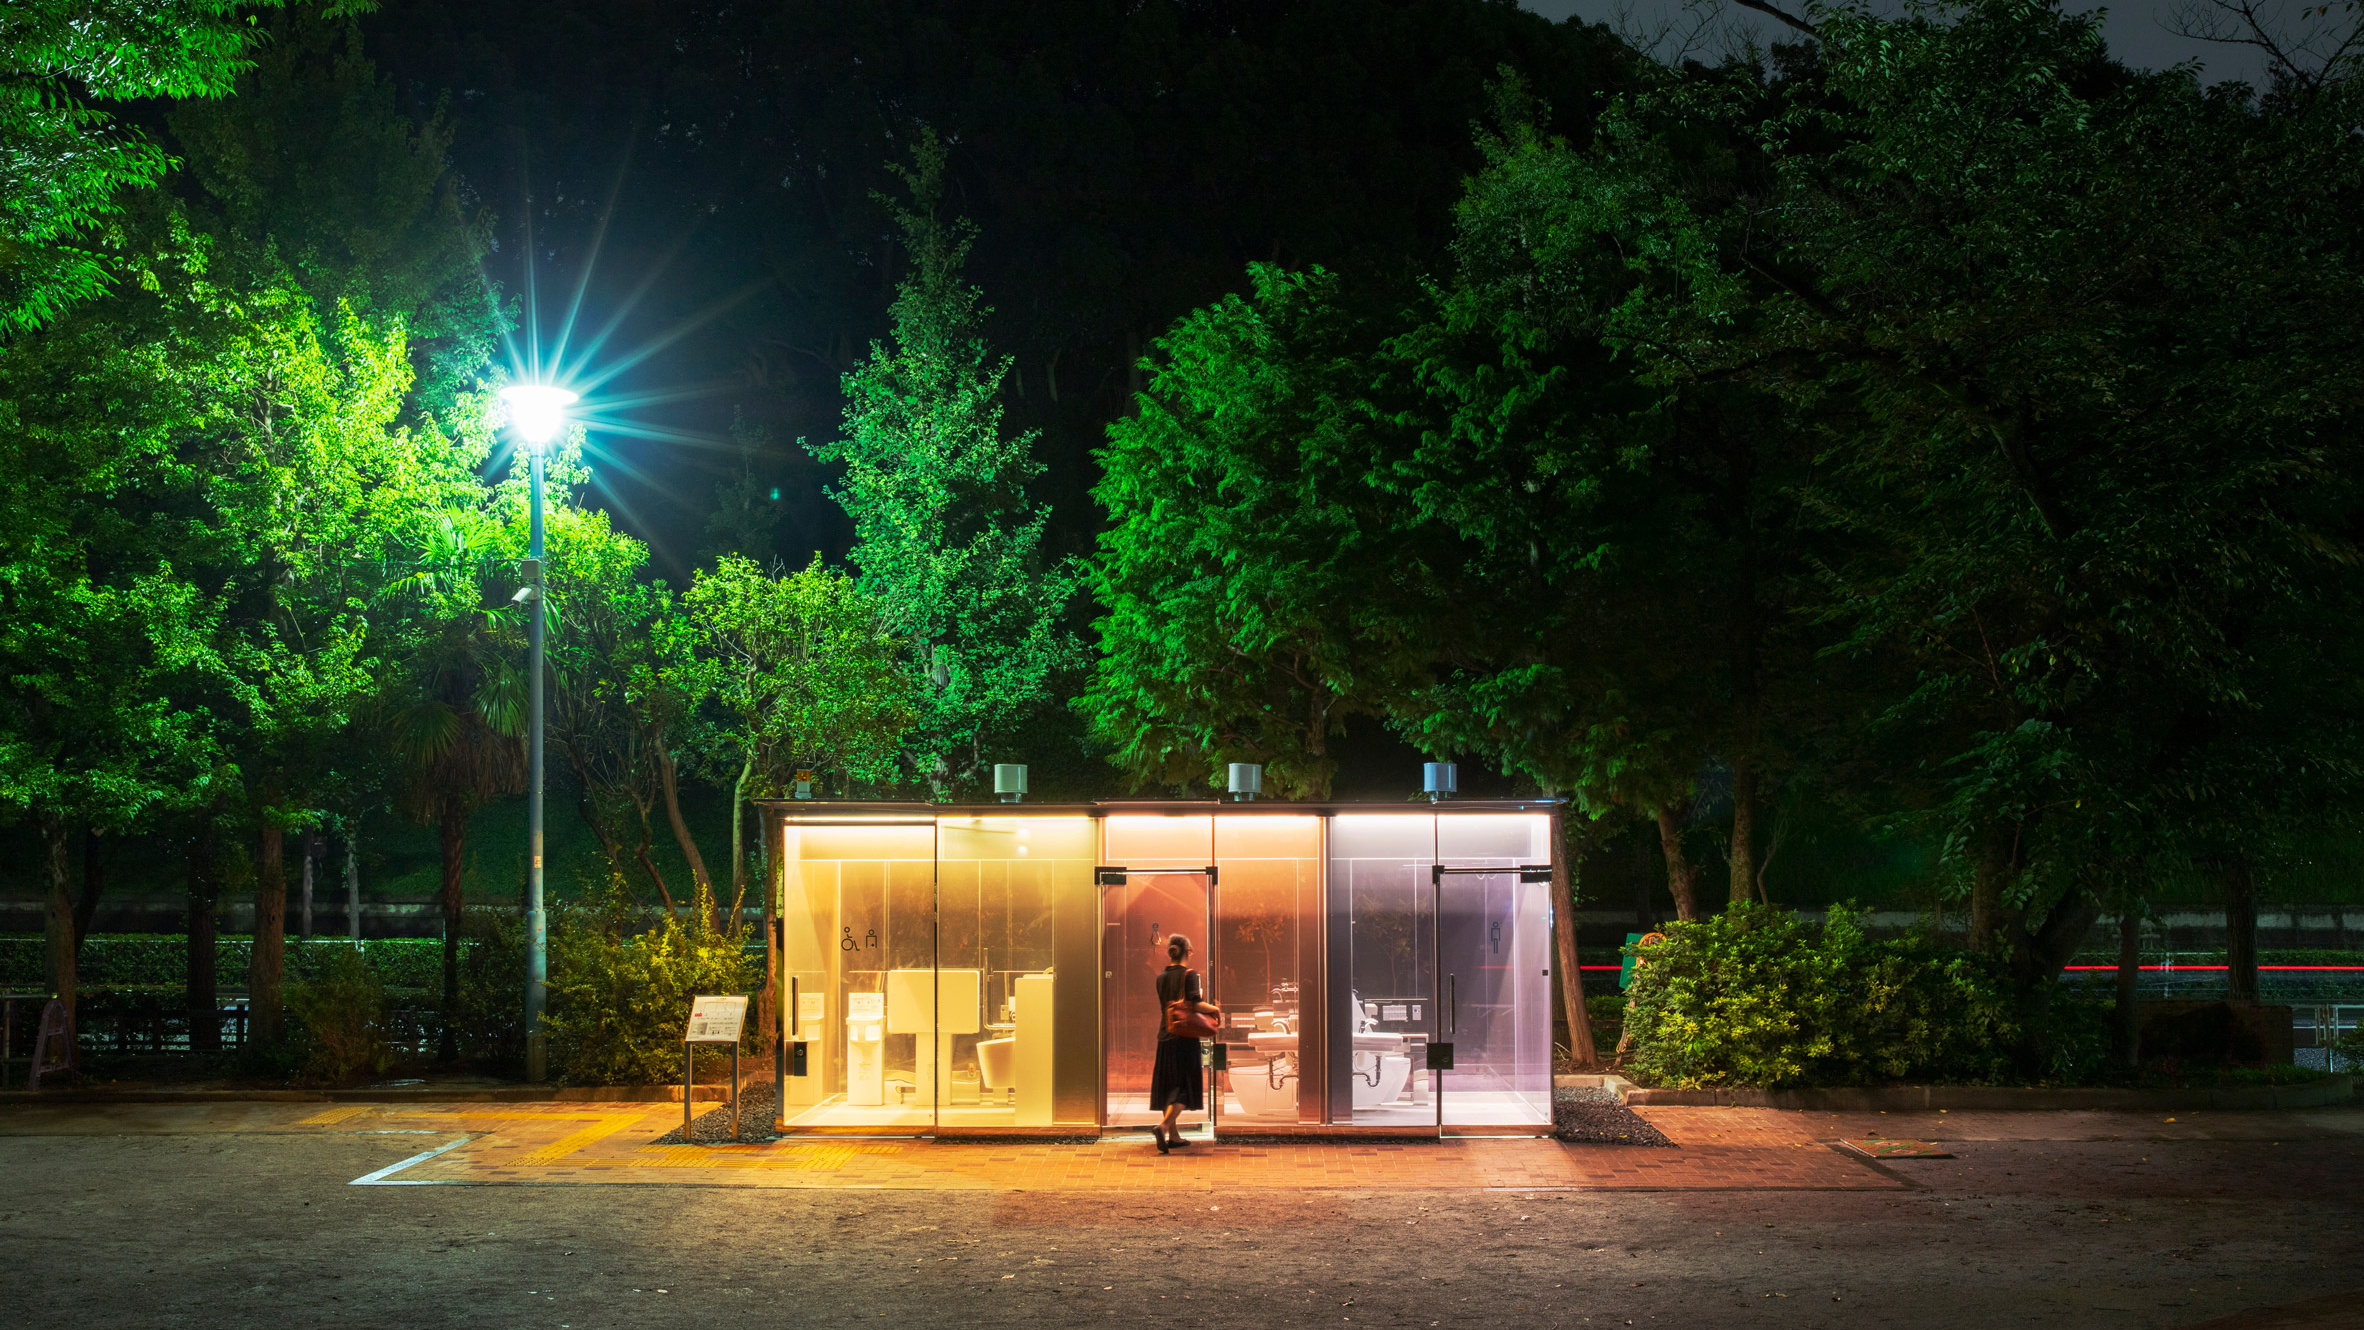 Public toilets in Tokyo's Yoyogi Fukamachi Mini Park and the Haru-No-Ogawa Community Park by Shigeru Ban for theTokyo Toilet project